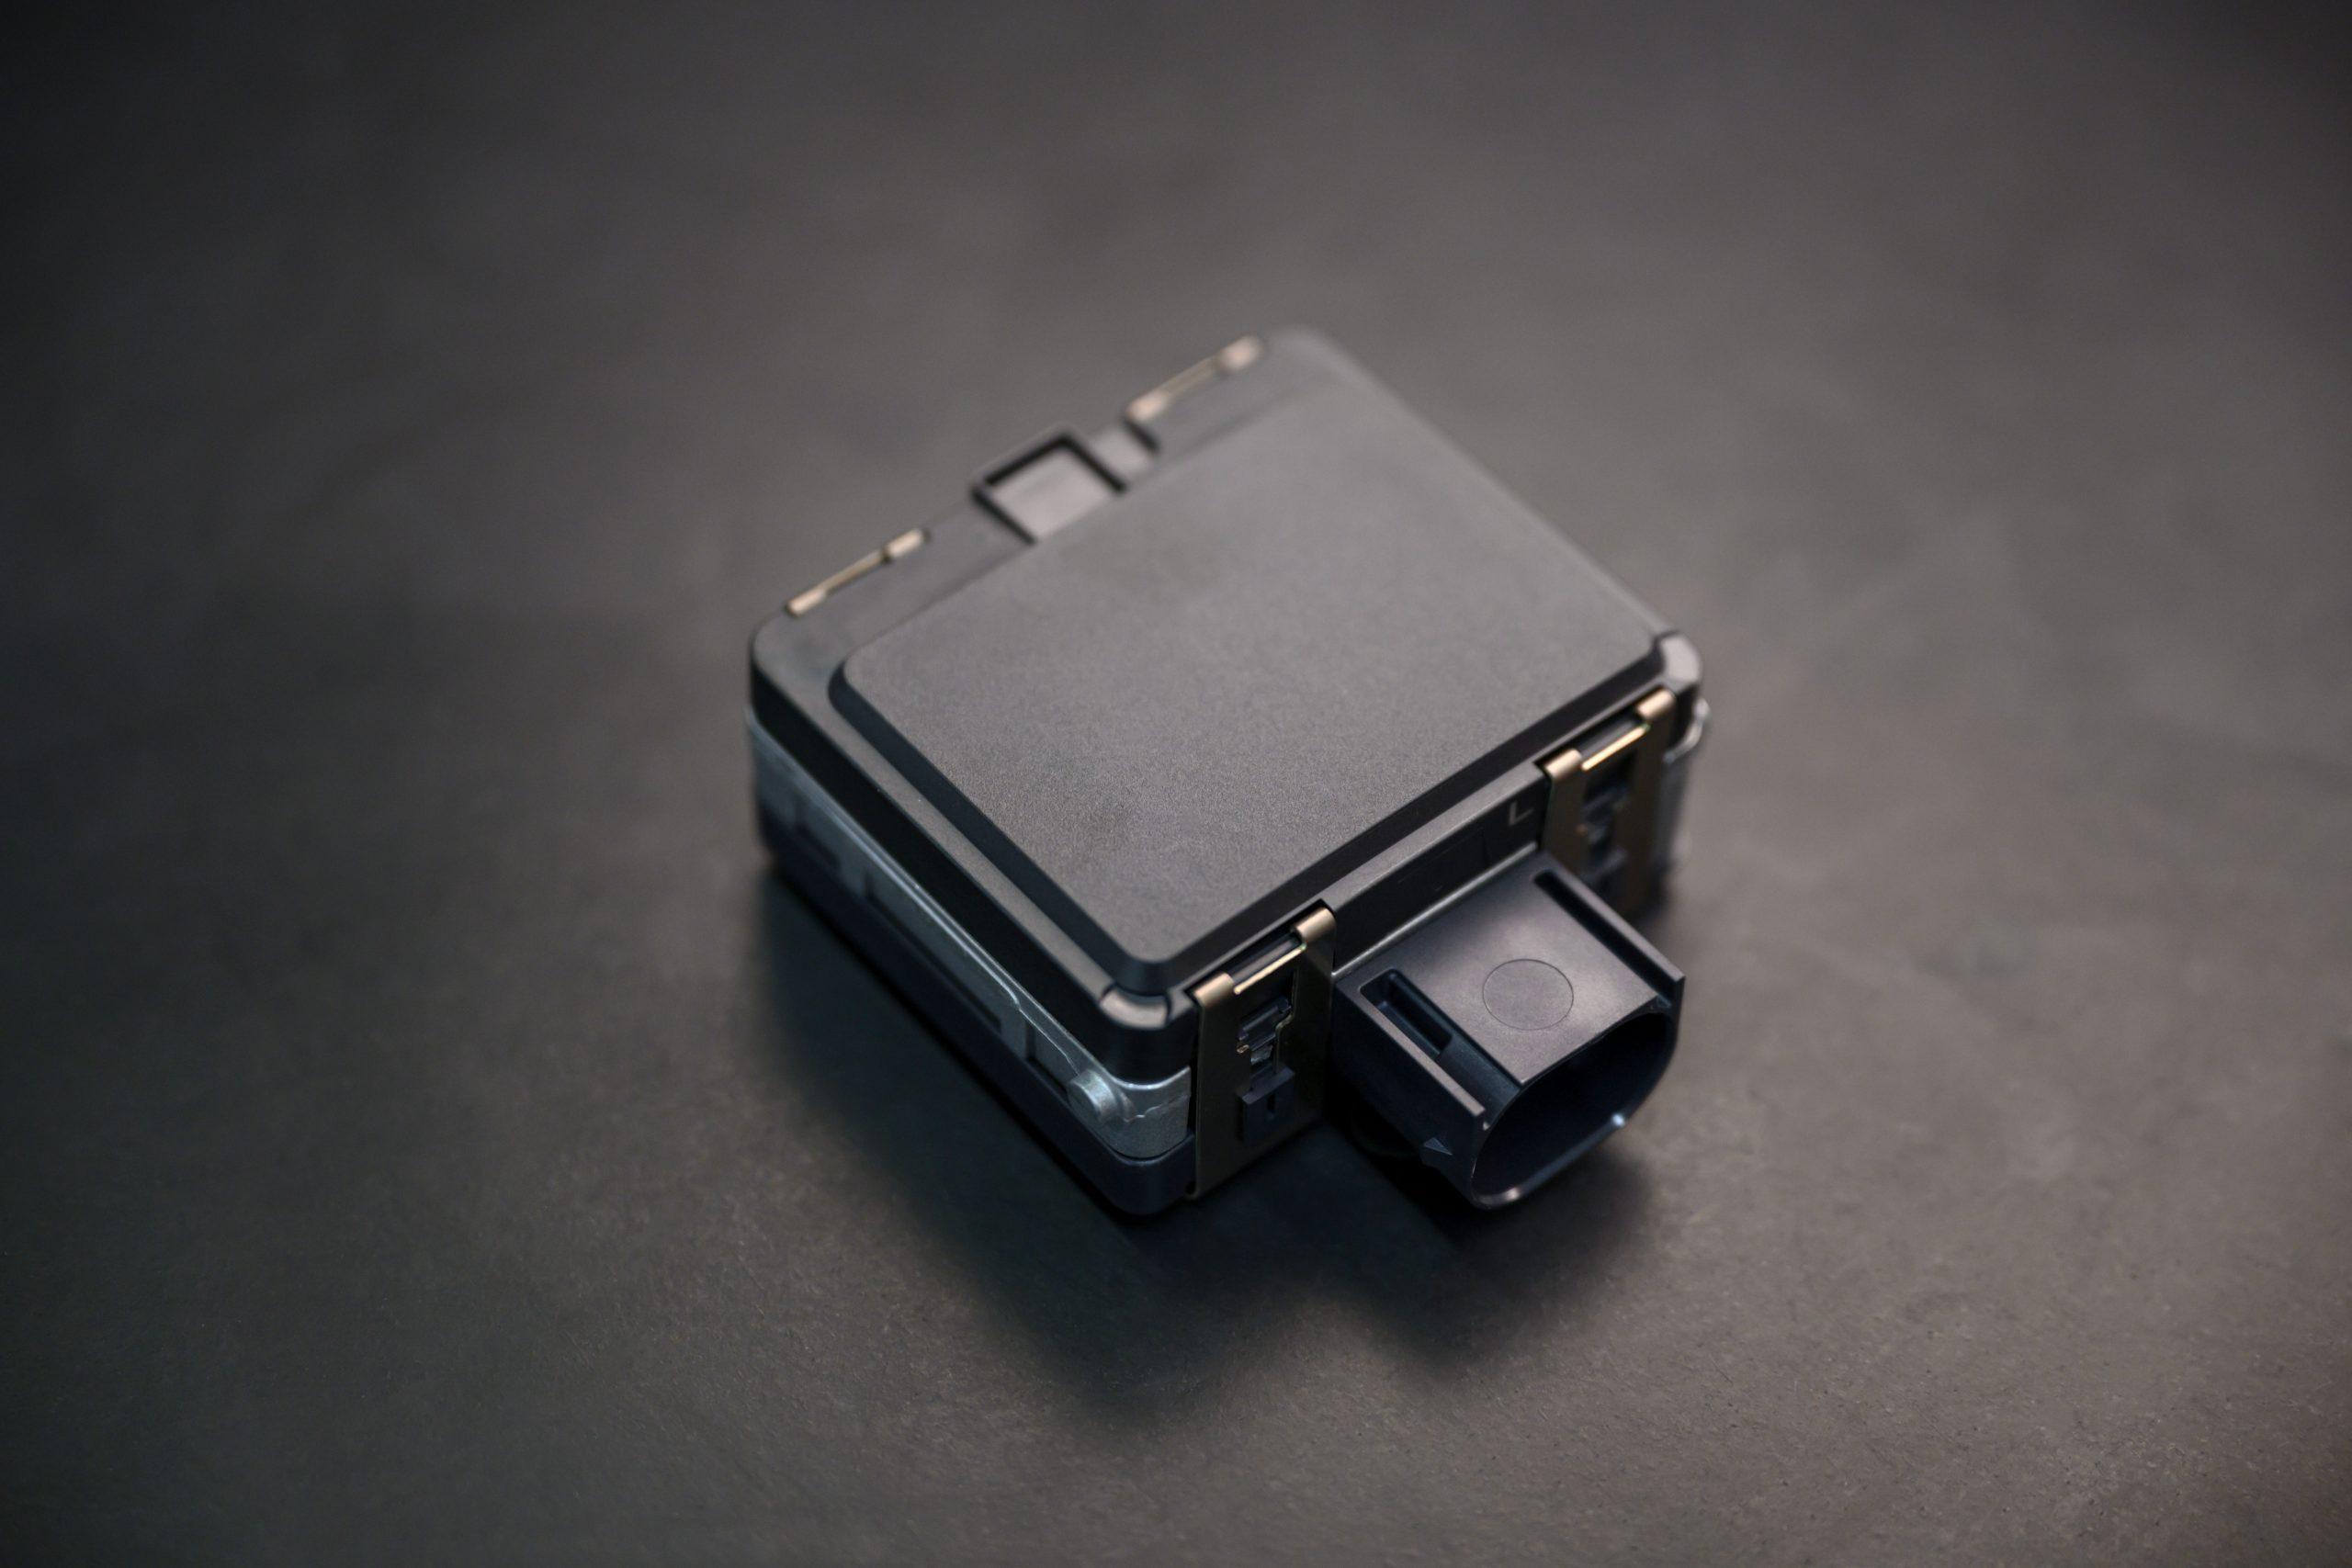 DUCATI - The radar has compact dimensions (70 x 60 x 28 mm)